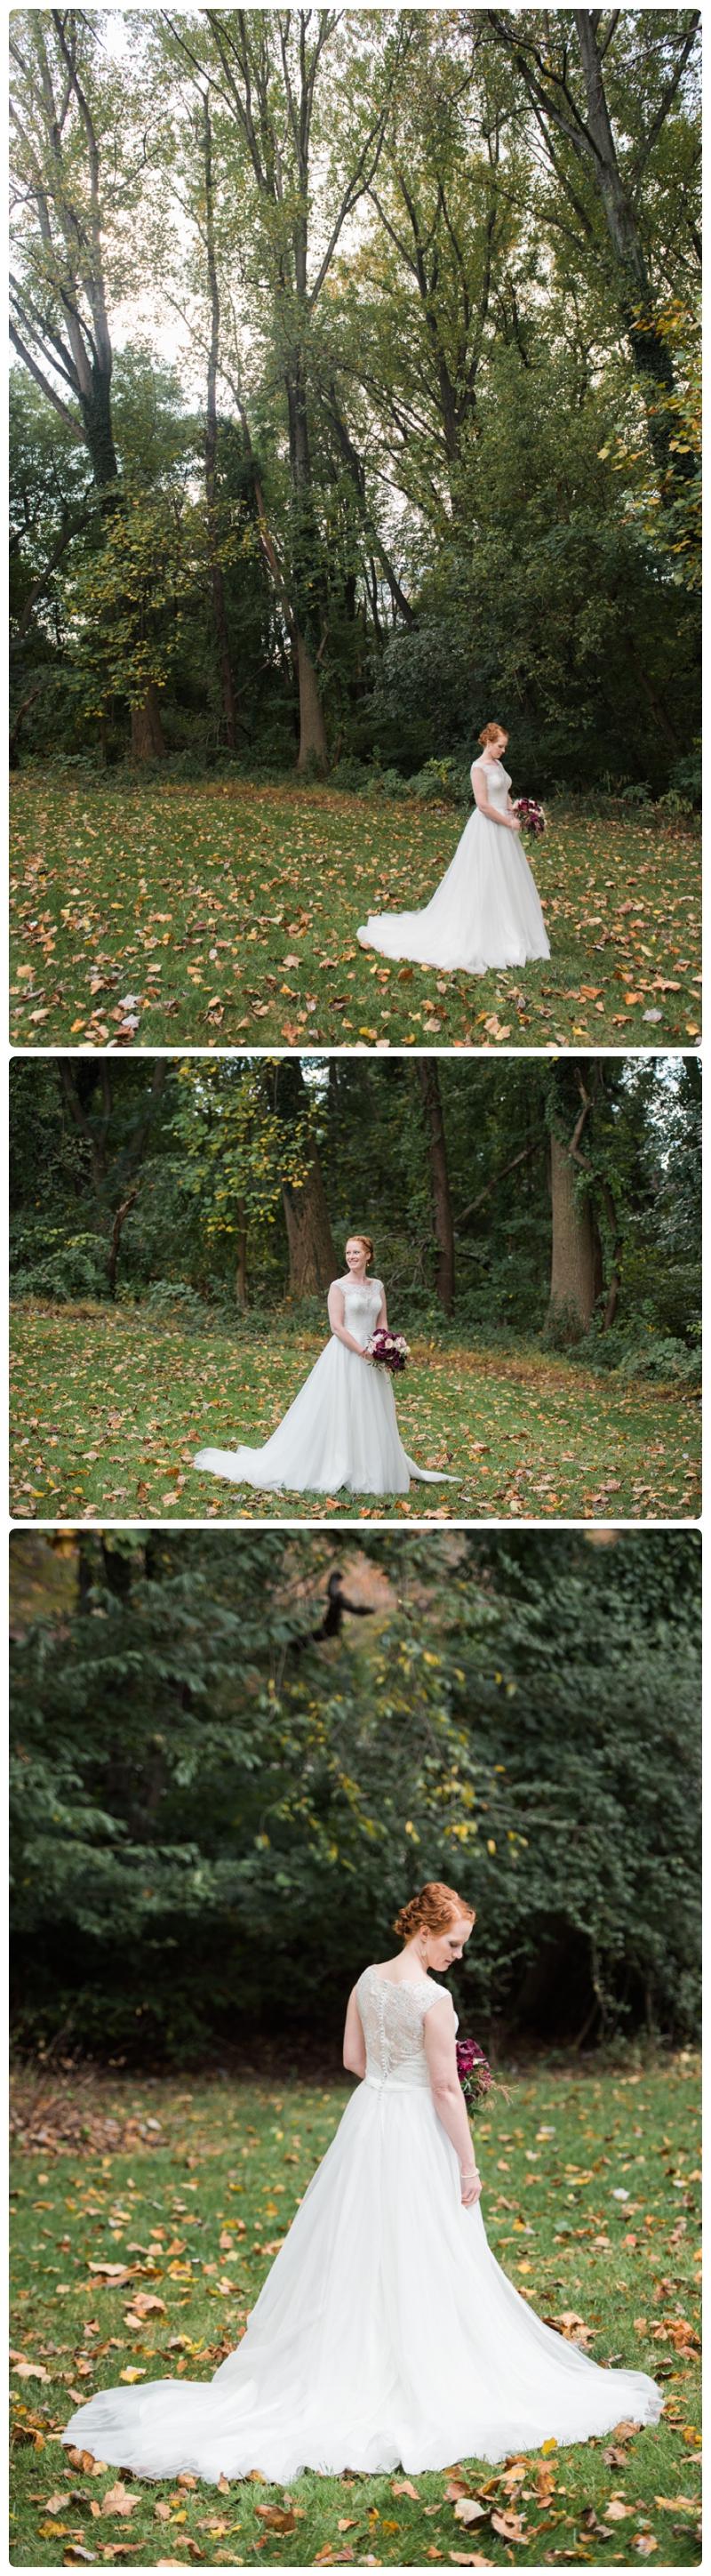 Wedding in Falls Church Virginia by Rachael Foster Photography_0010.jpg